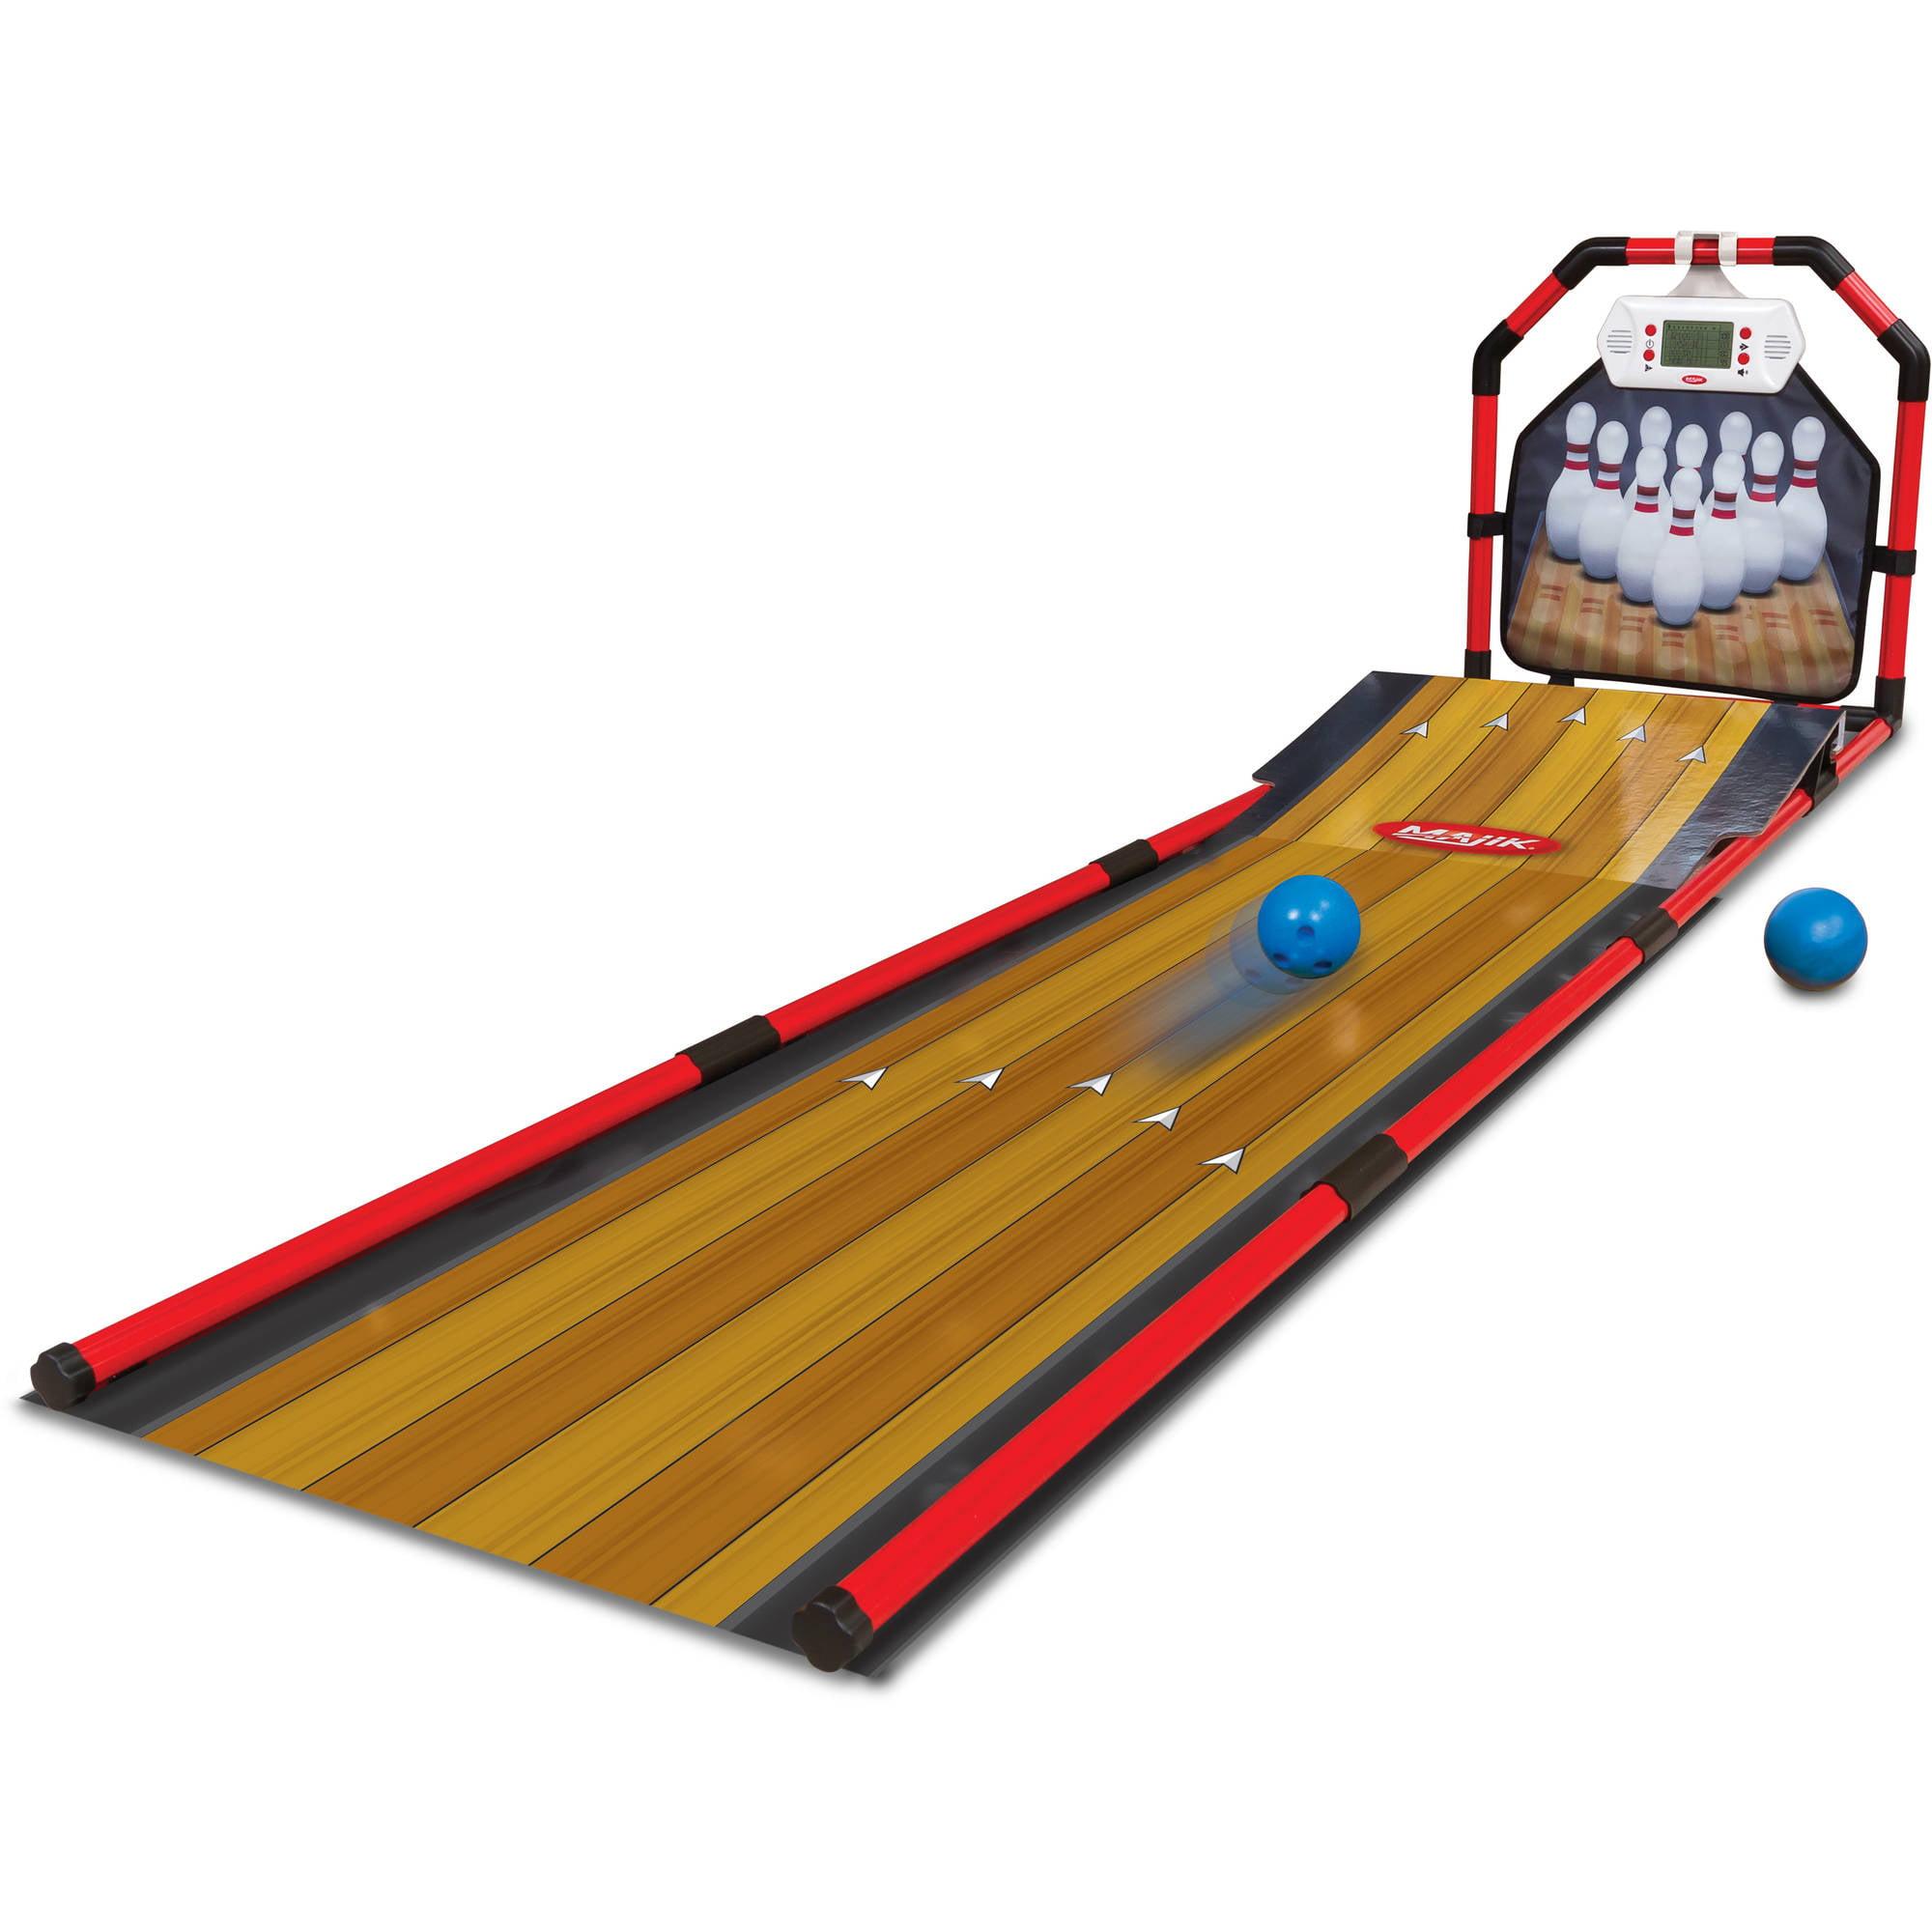 Majik Roll-A-Strike Electronic Bowling Game